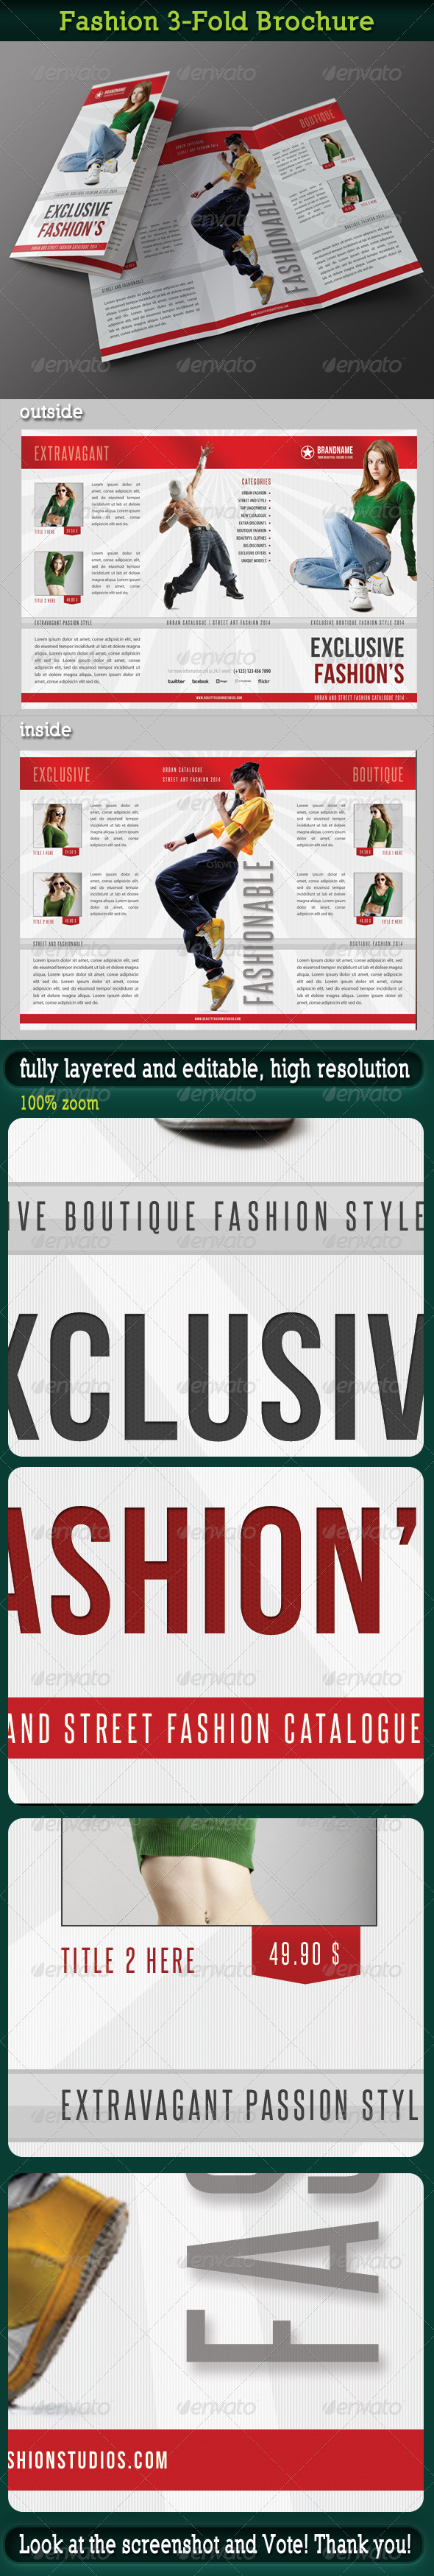 Fashion 3-Fold Brochure 15